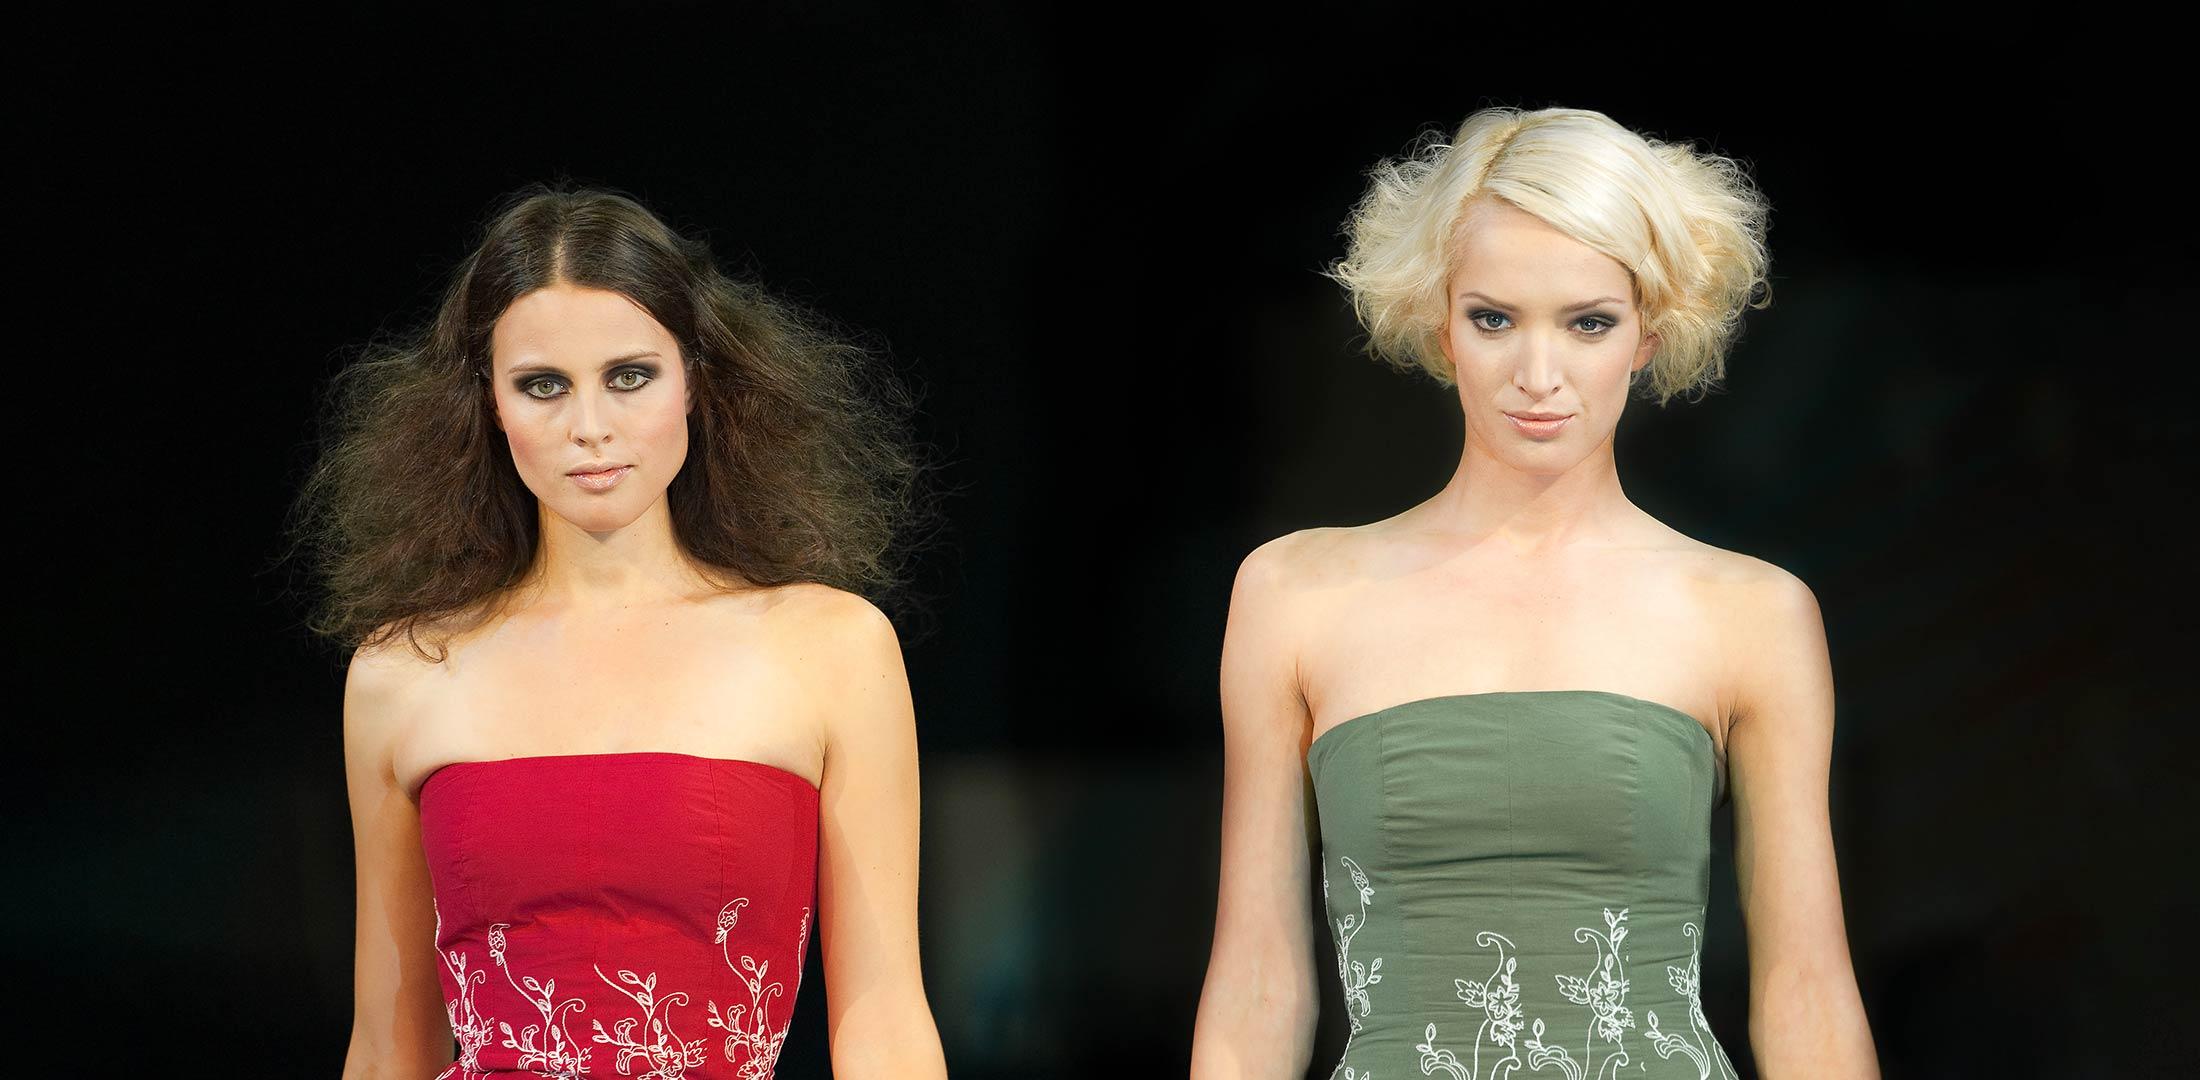 Model Frauen bei Fotoshooting